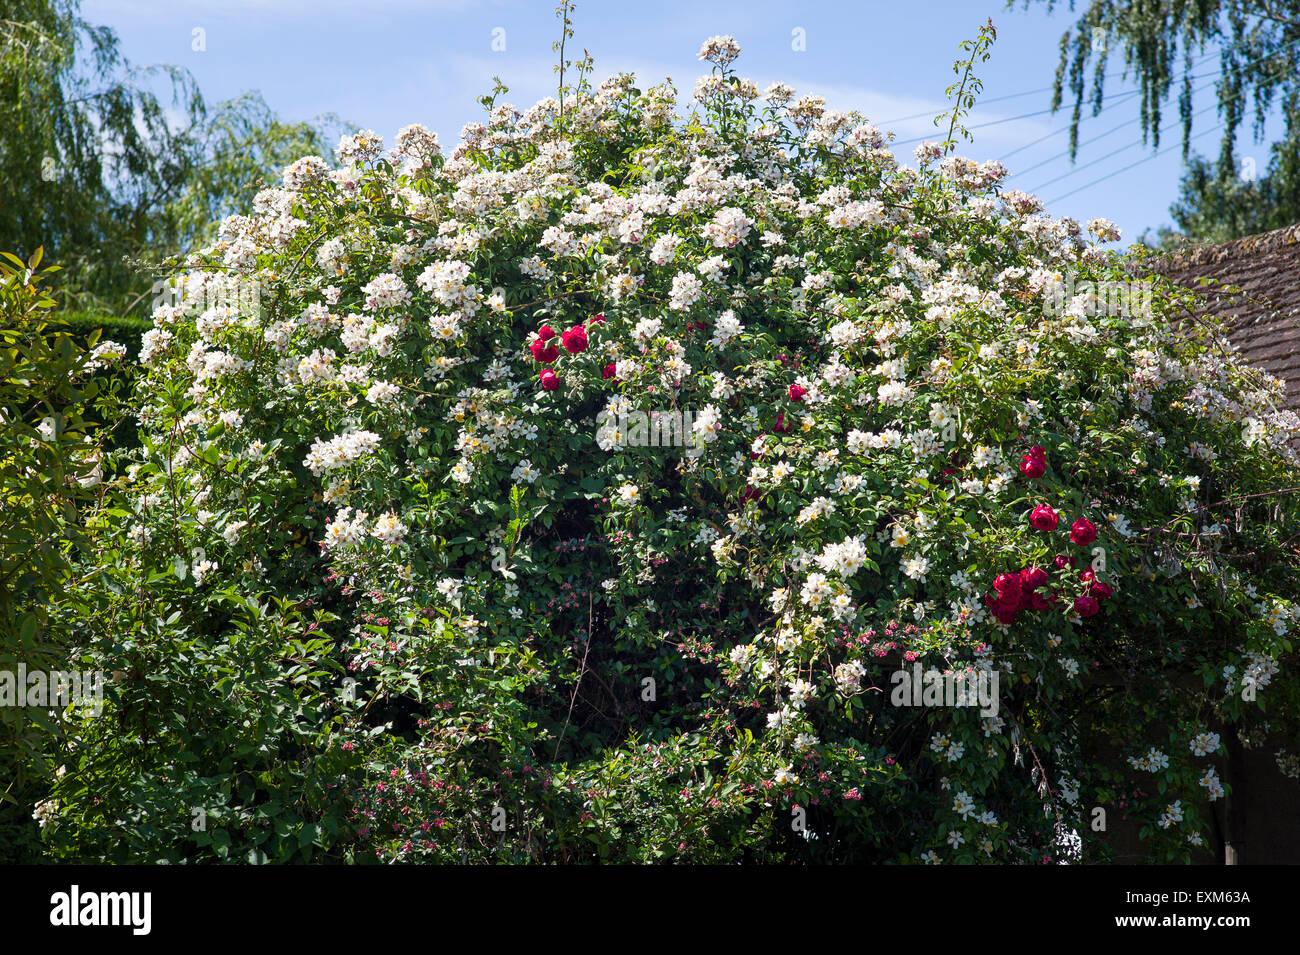 Climbing rose 'Wedding Day' with red rose 'Danse de Feu' and pink Escallonia peeping through the - Stock Image